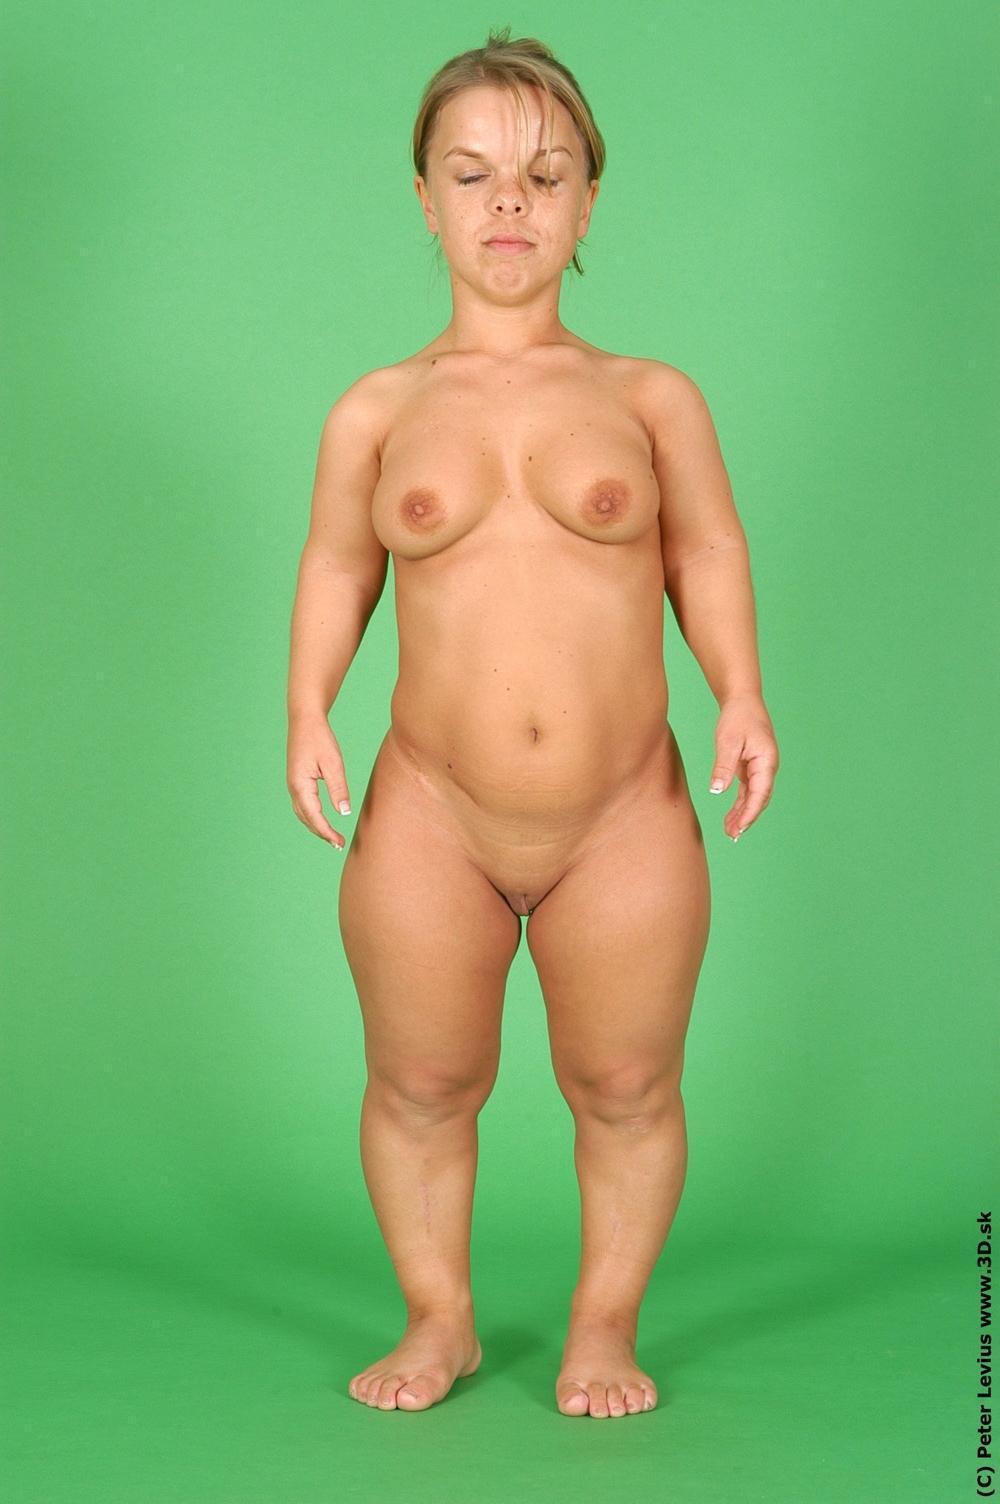 midget photo girls naked galleries